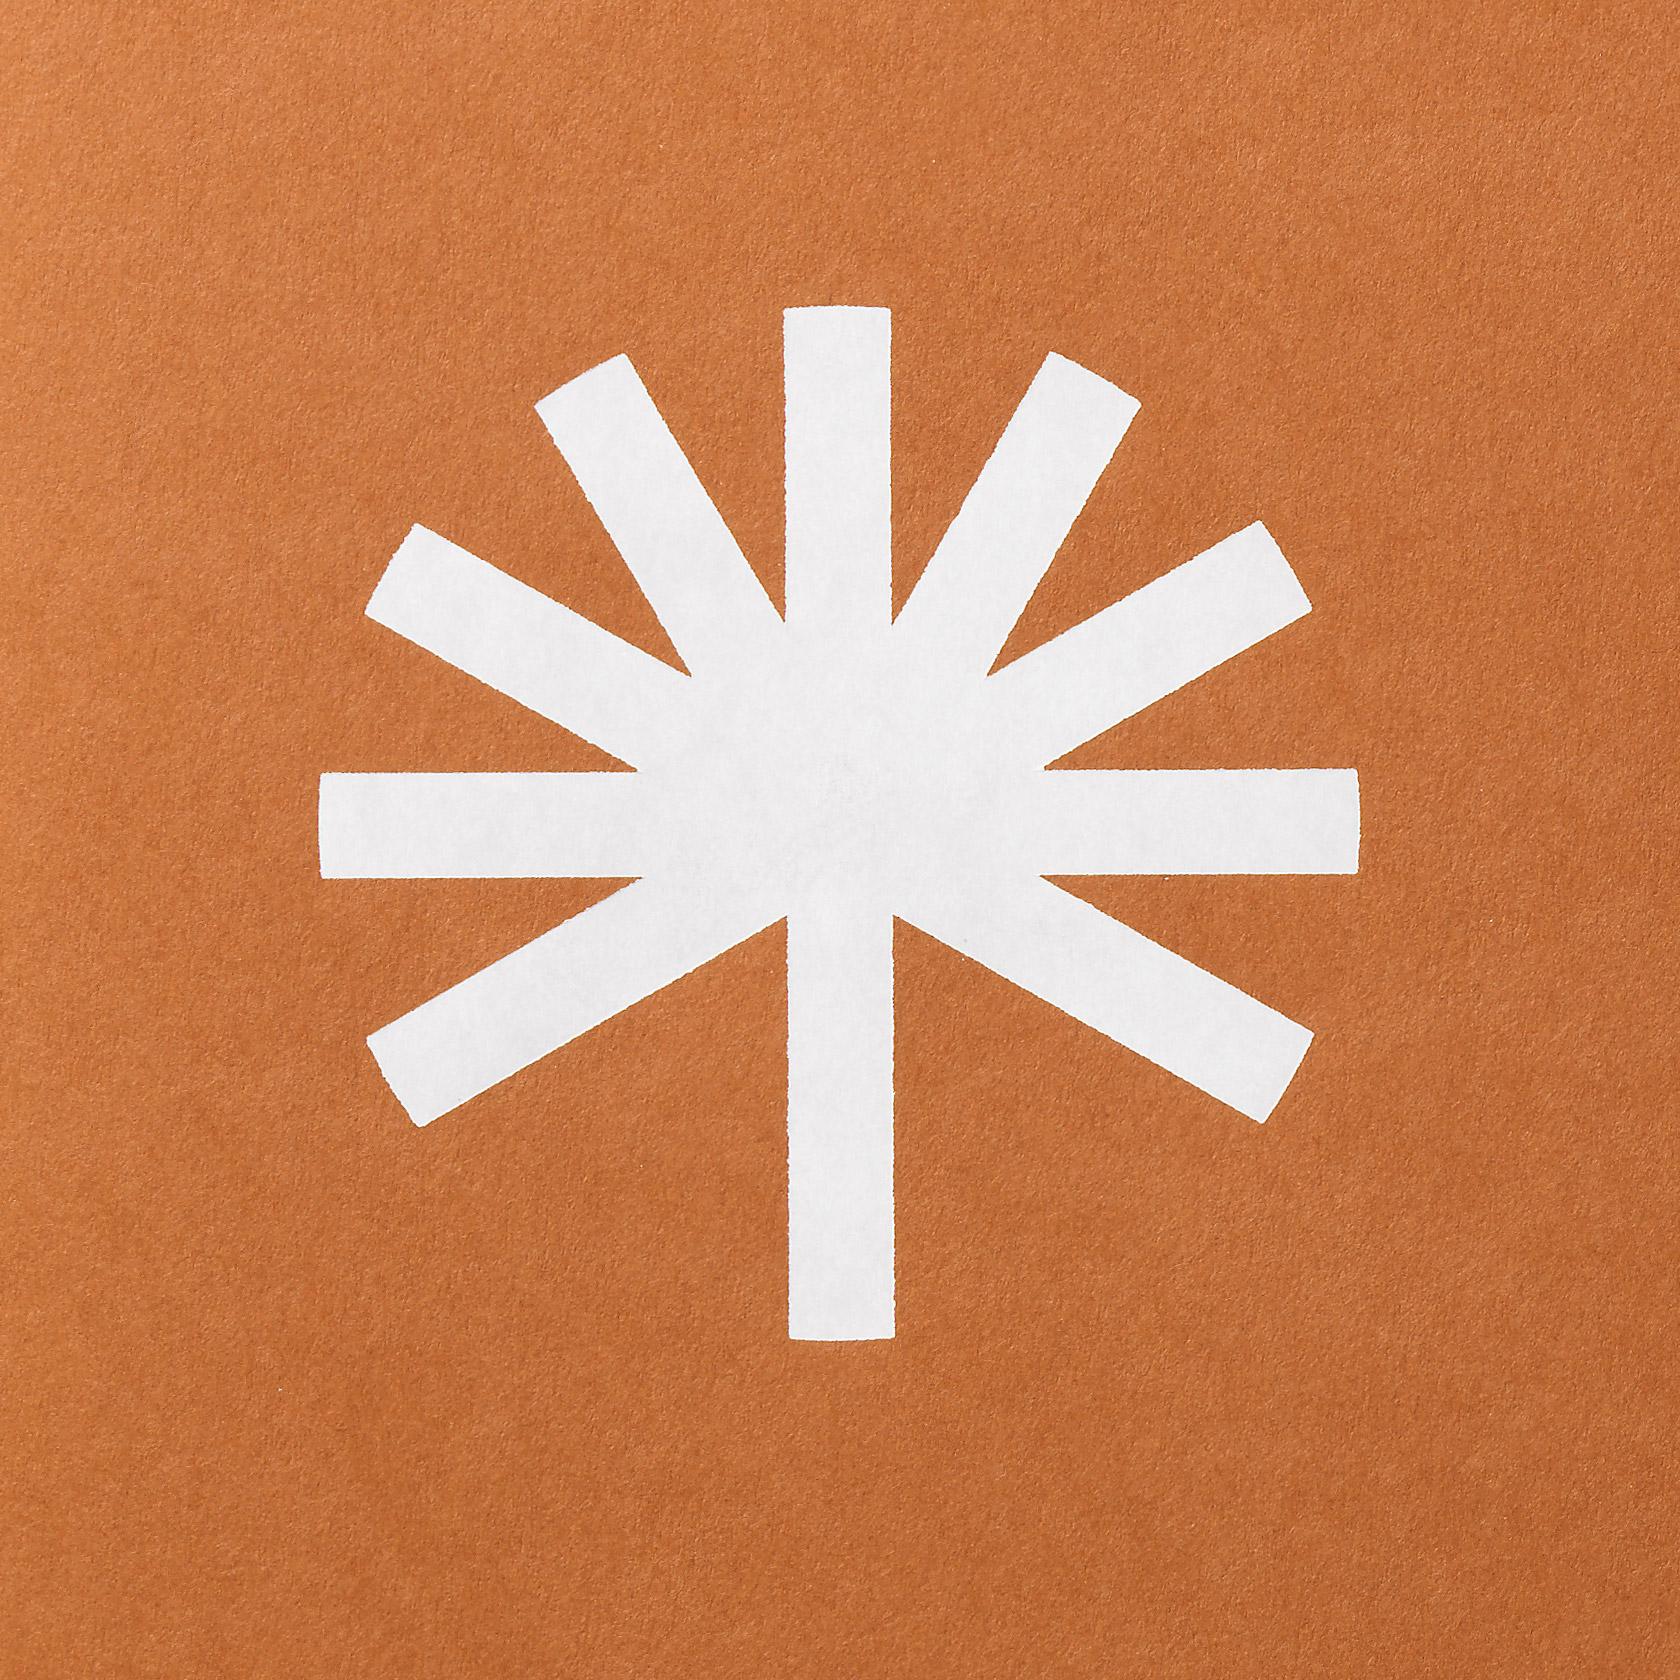 bpf_logo-icon_1680x1680